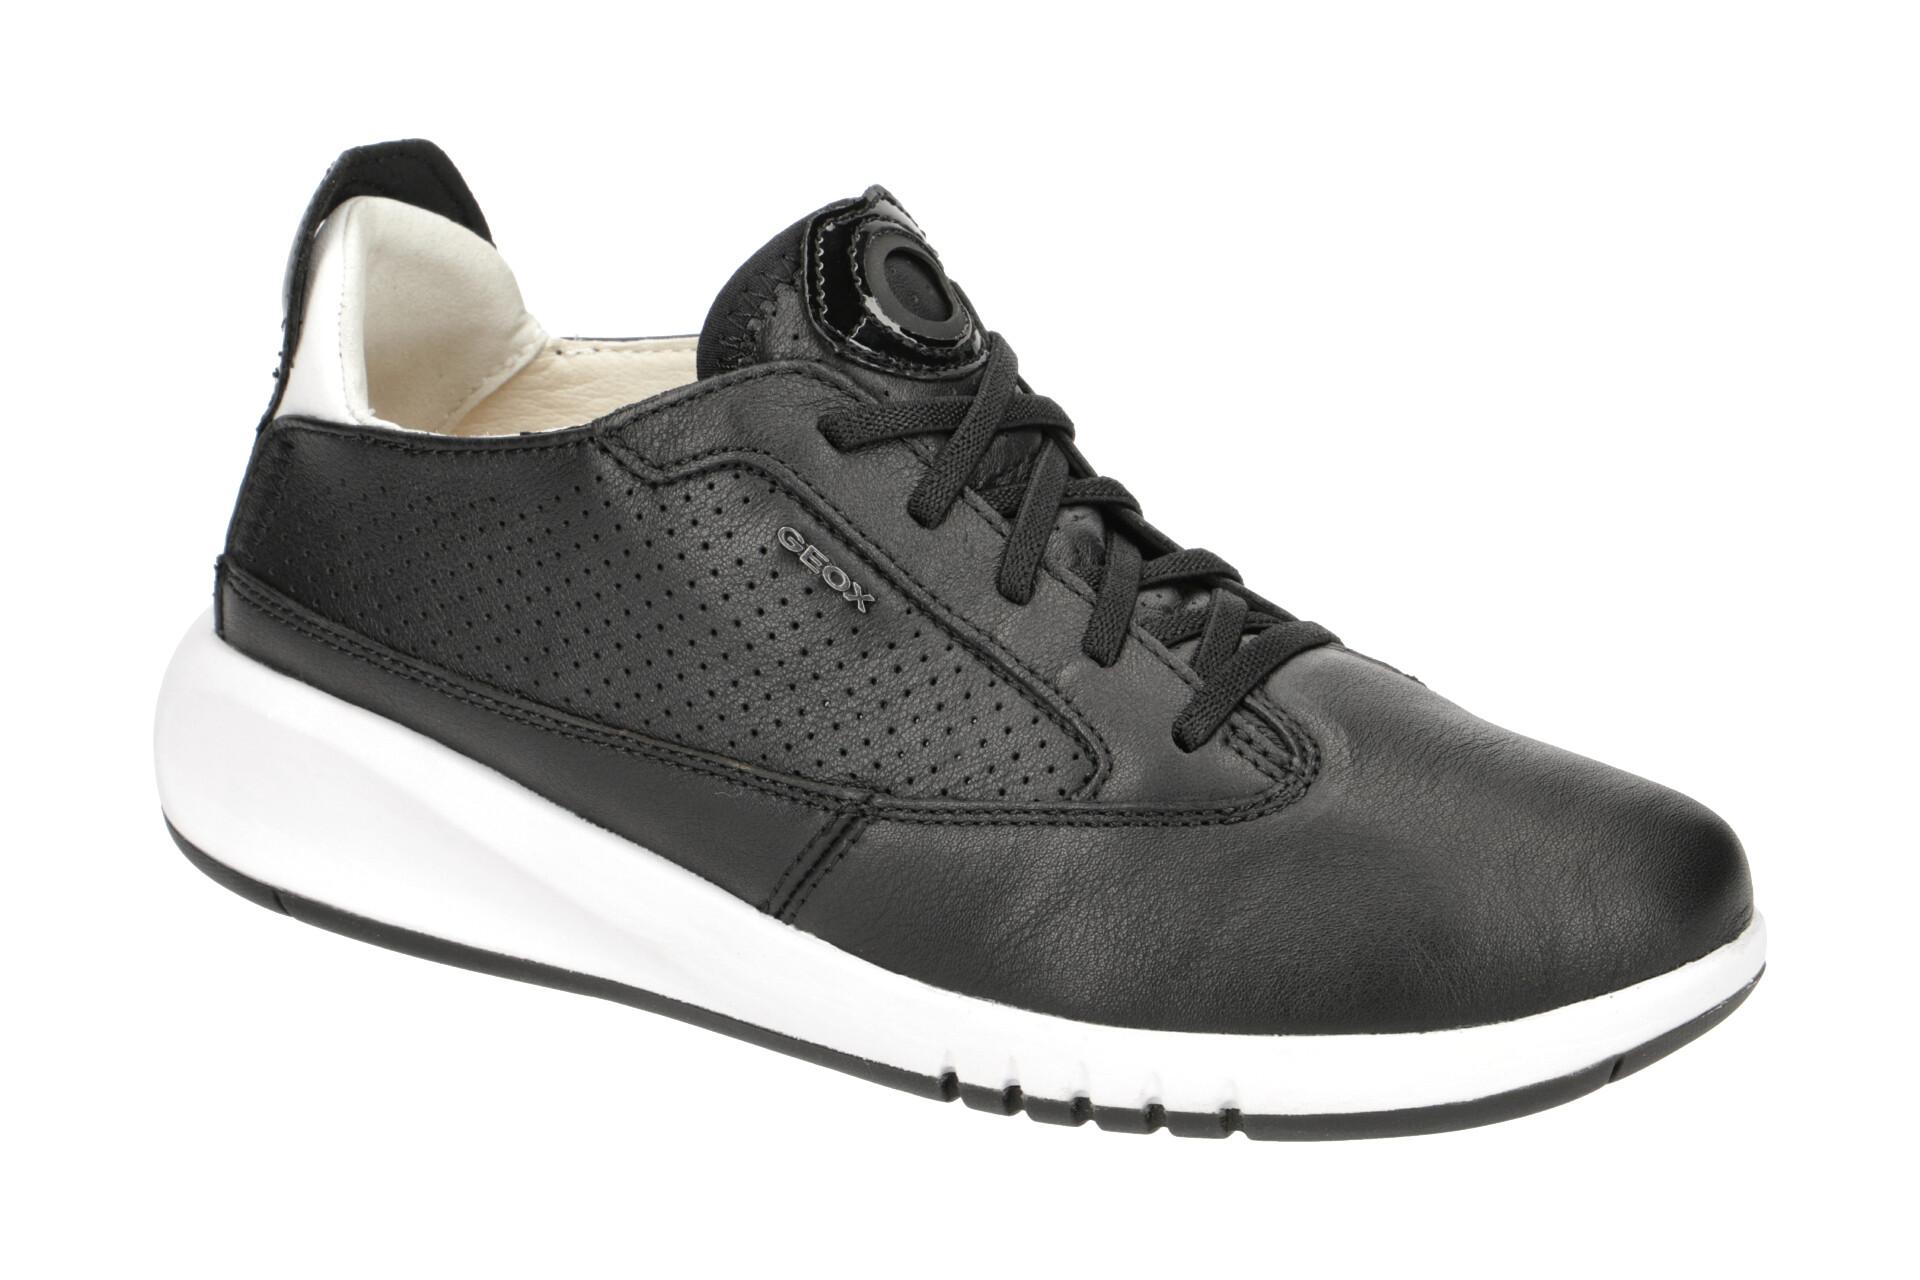 Geox Damenschuhe Halbschuhe Sneaker AERANTIS Donna